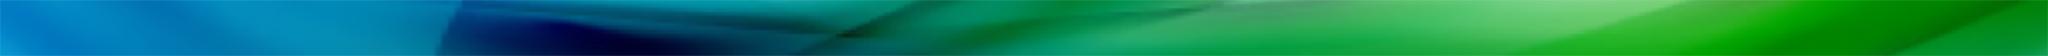 ISMCOE-headerfooter-swooshbar.png